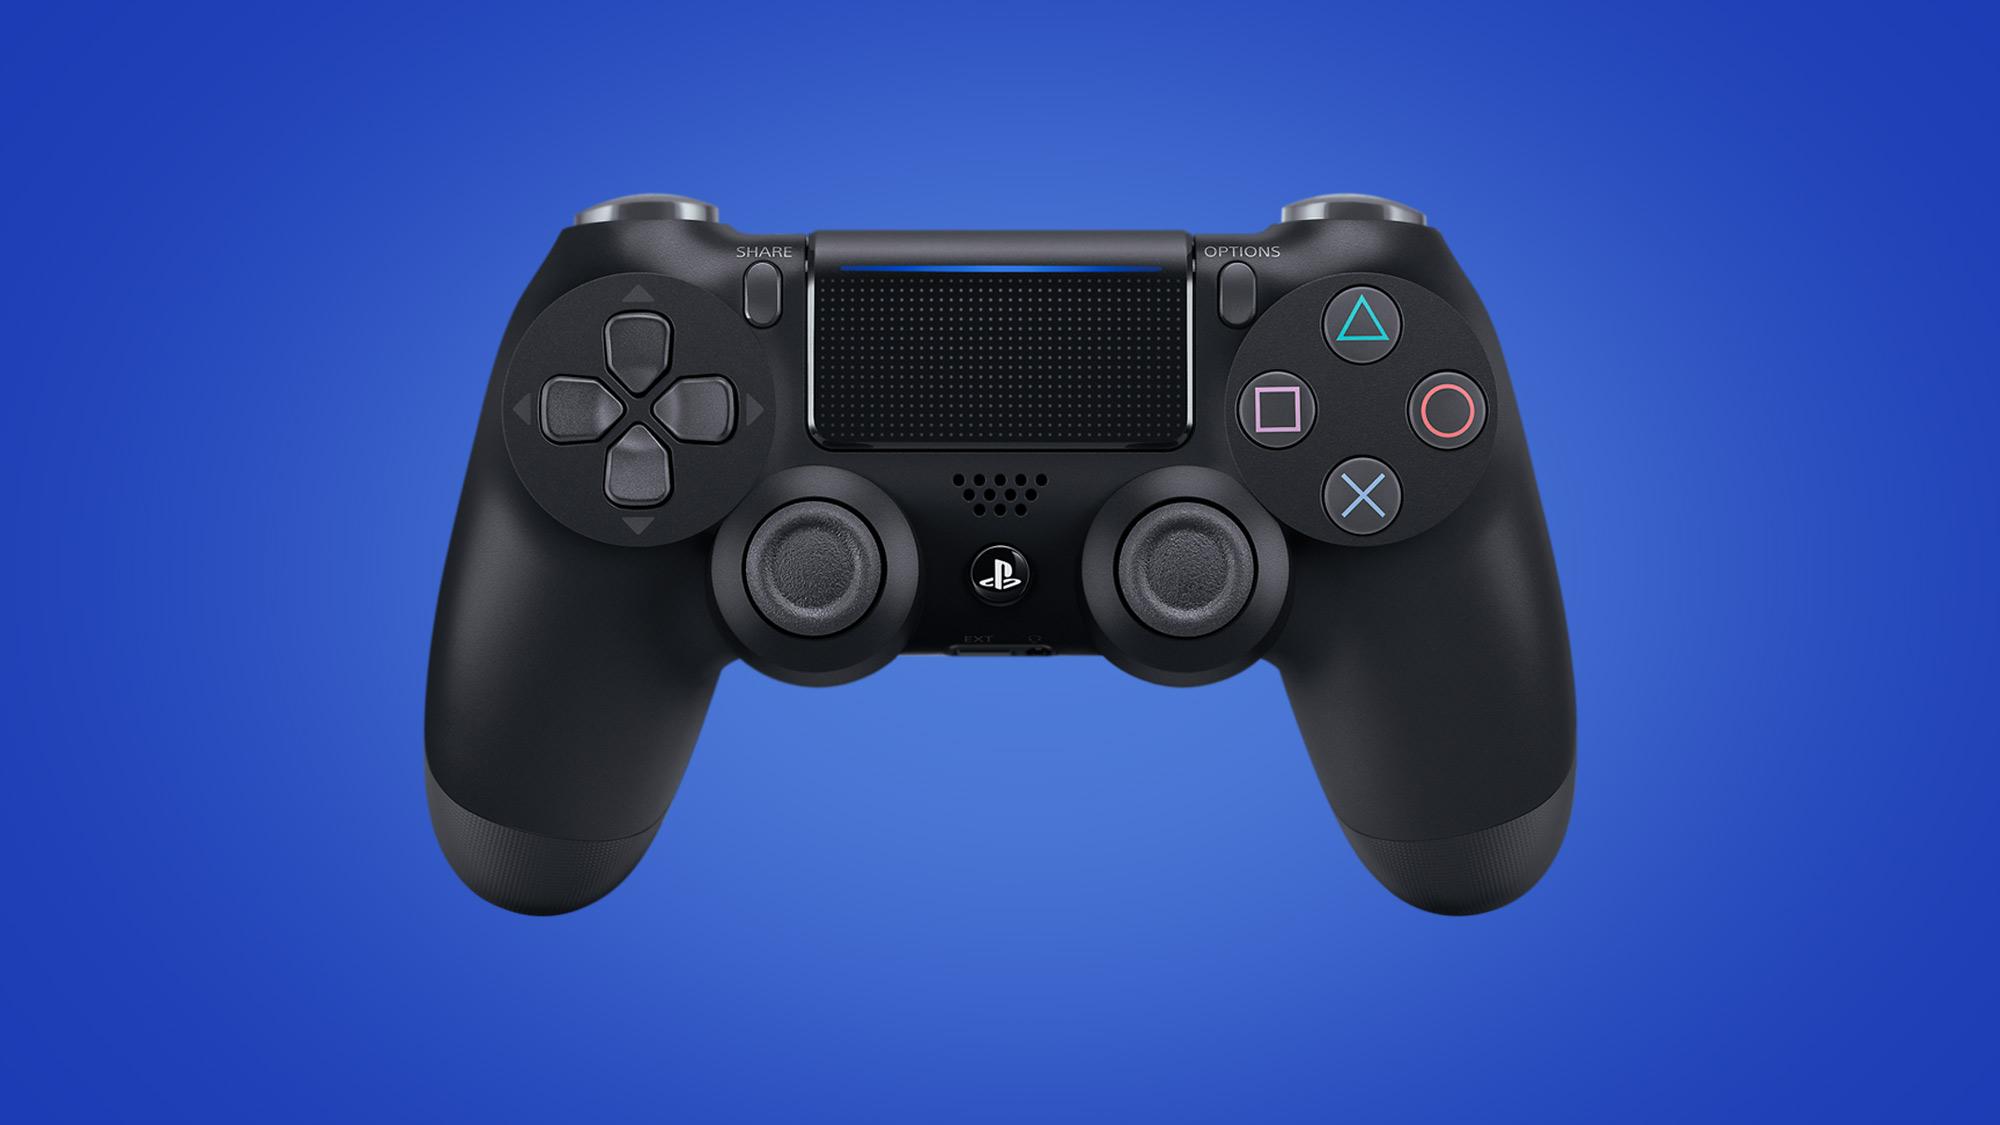 The Best Dualshock 4 Deals For August 2021 Cheap Ps4 Controller Prices Techradar